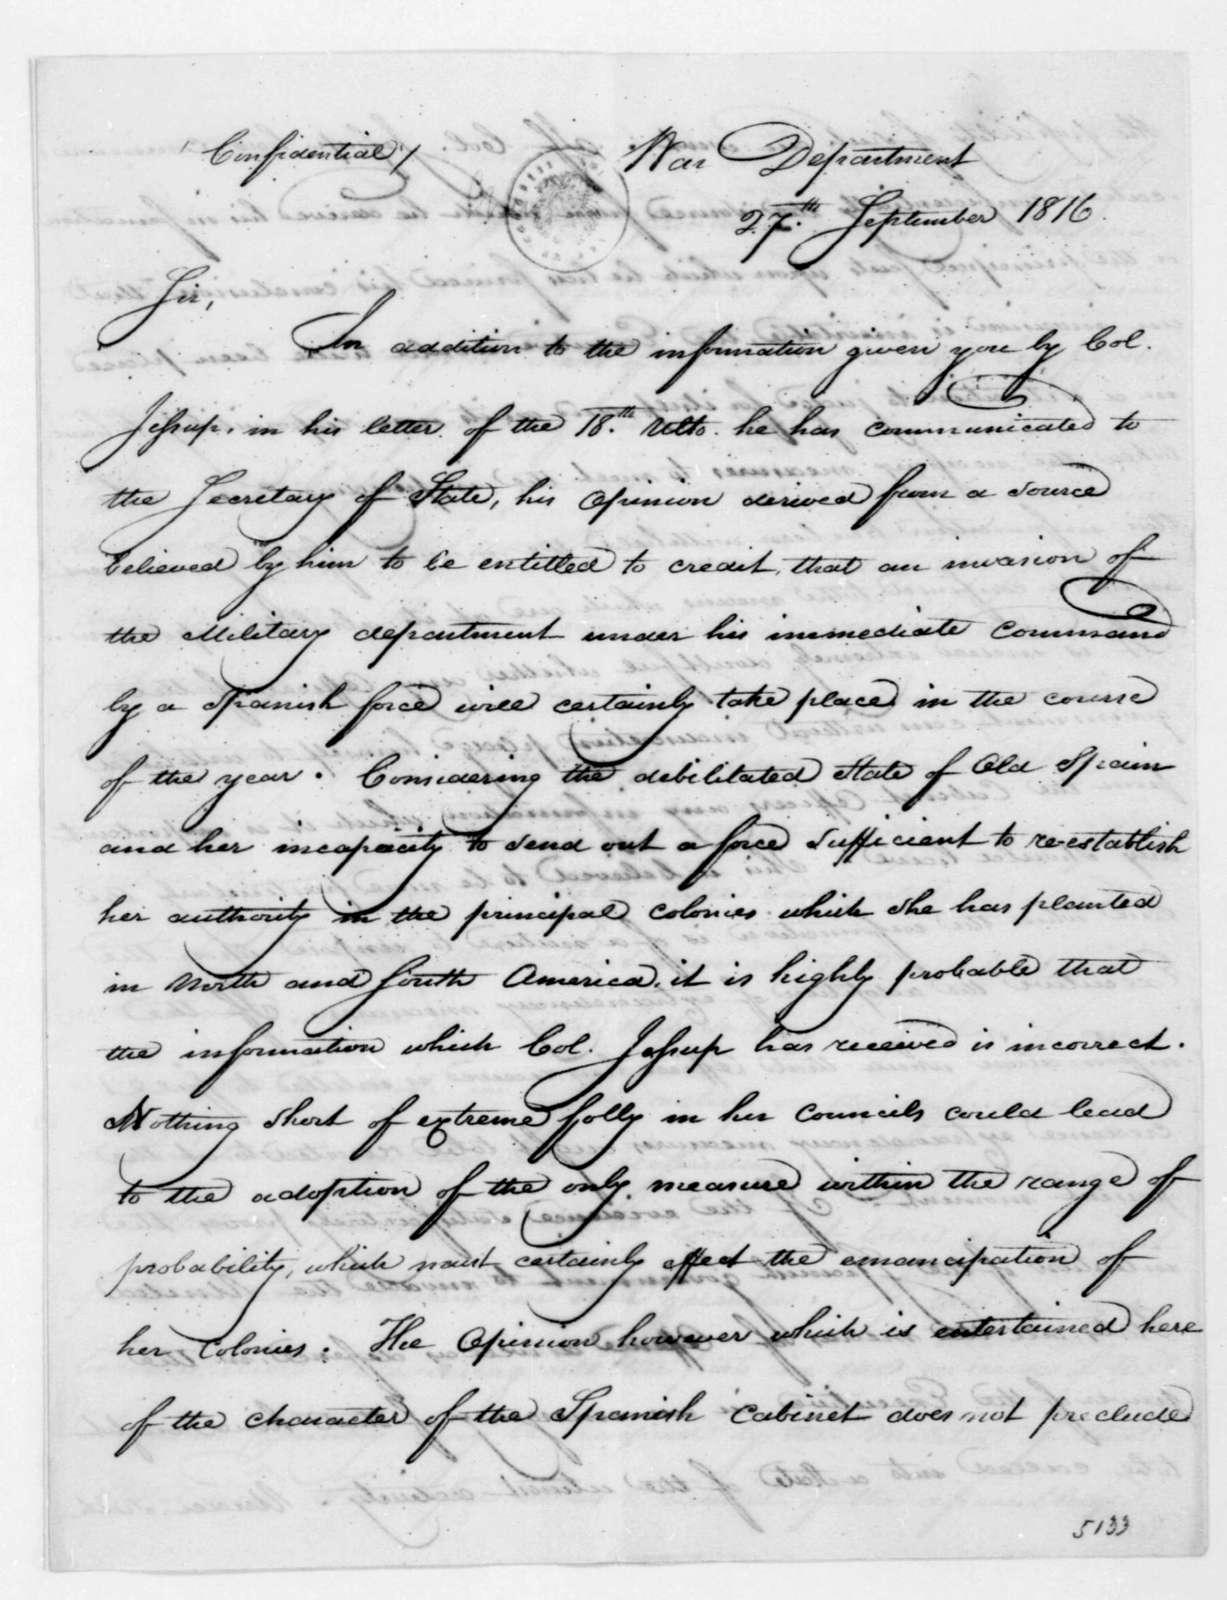 William H. Crawford to Andrew Jackson, September 27, 1816.